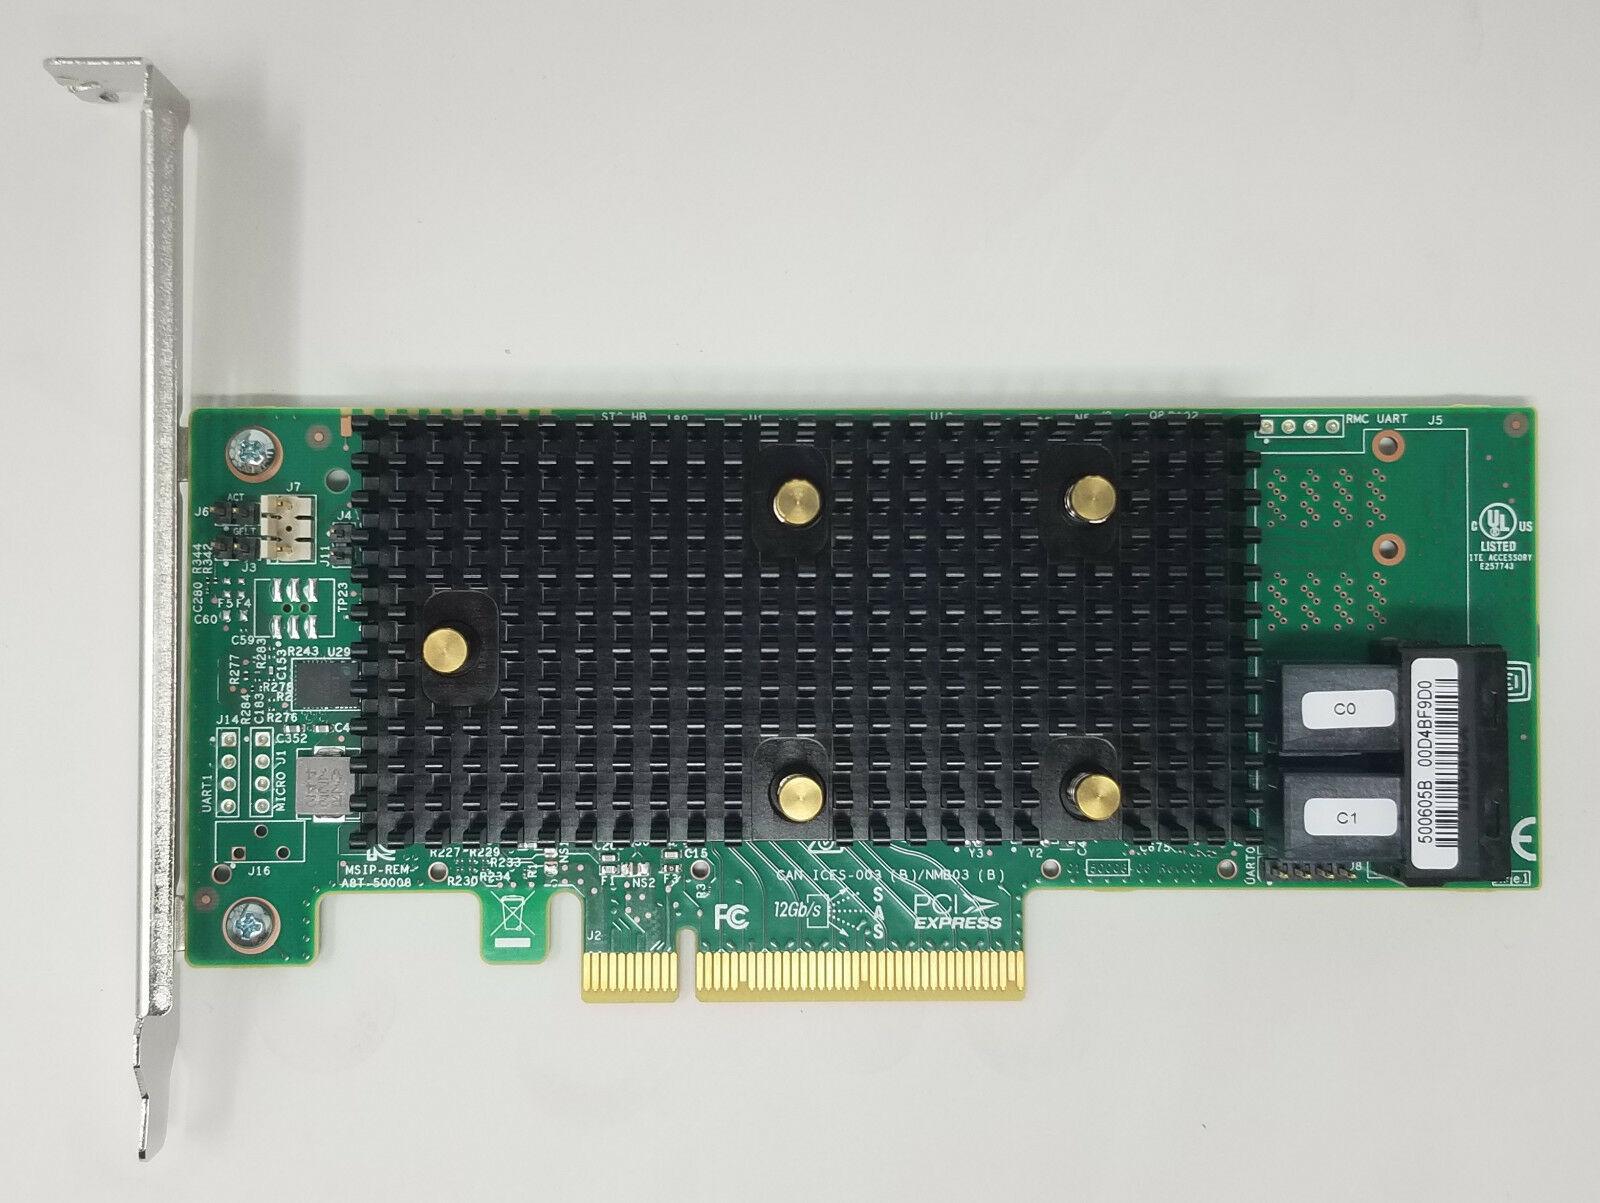 LSI9440-8i контроллер lsi rms3vc160 946902